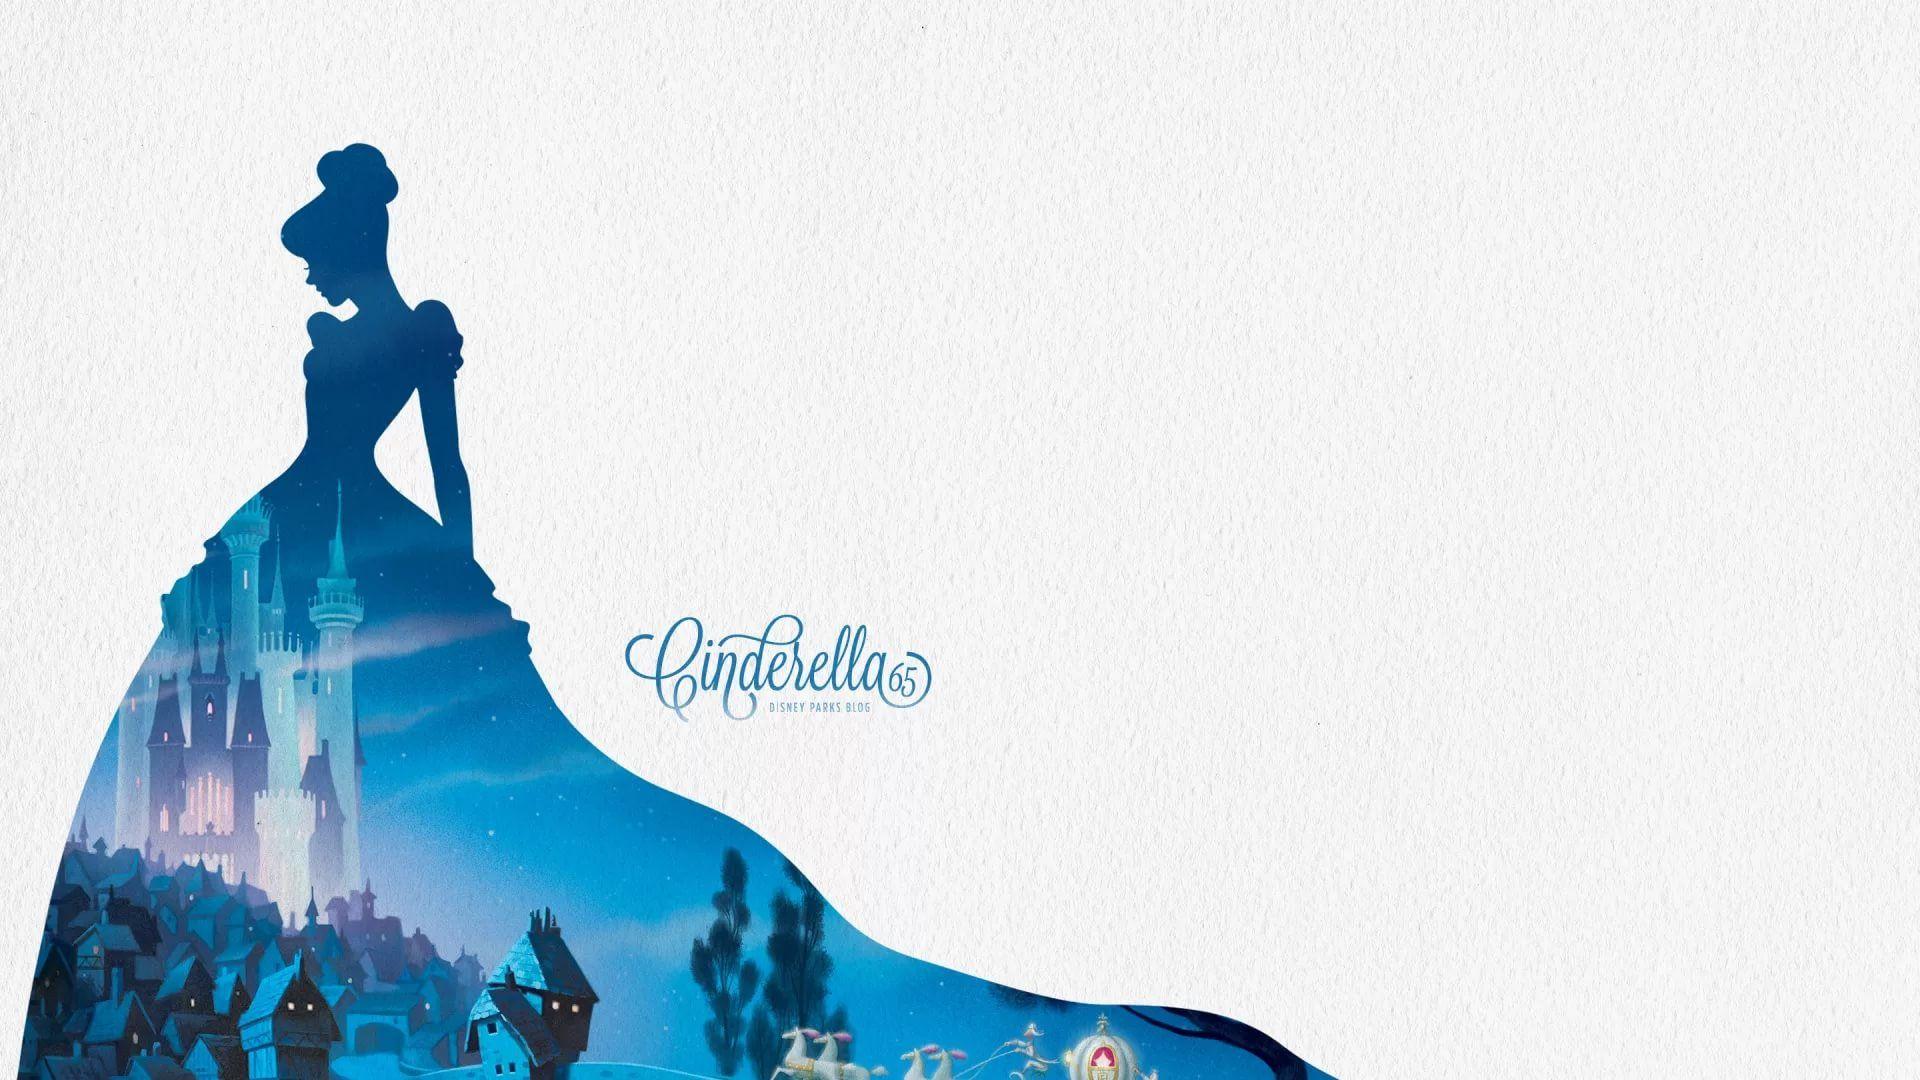 Cinderella computer wallpaper